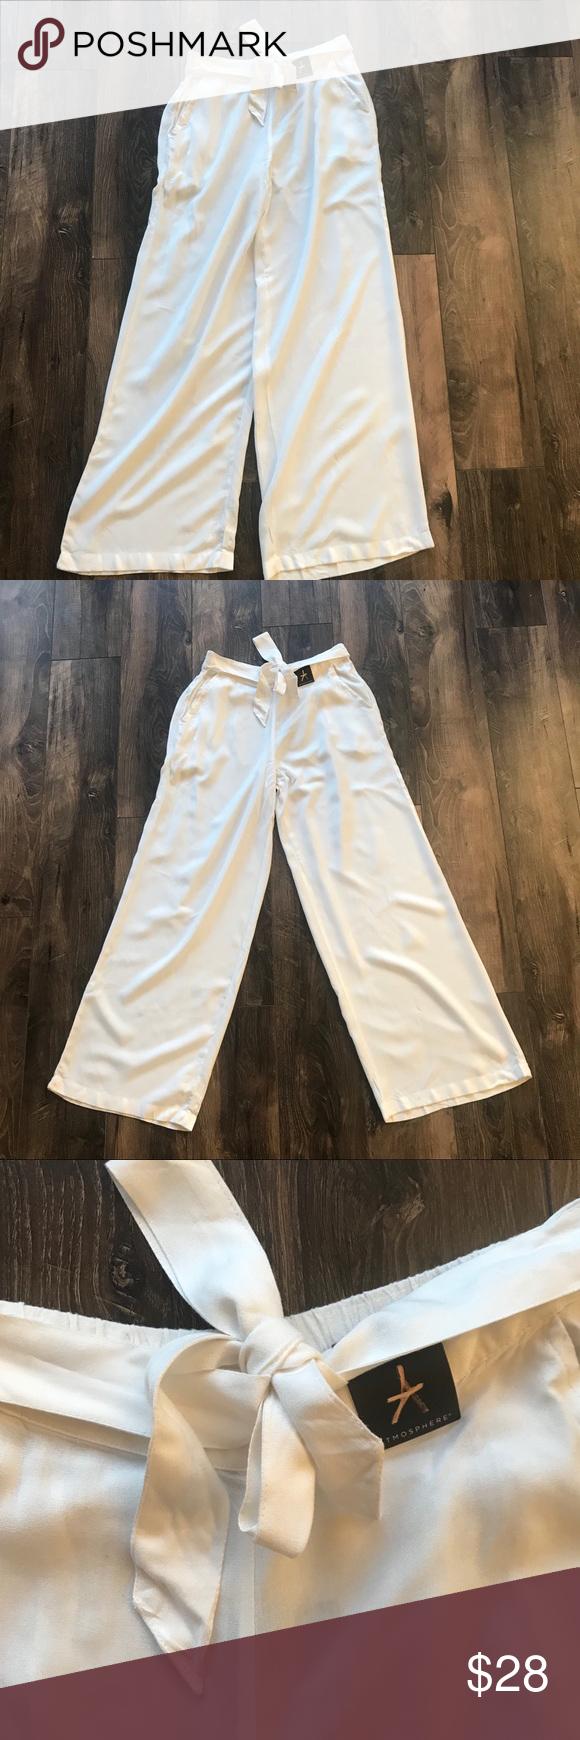 beda86a9baf2 White wide leg pants tie waist NWT